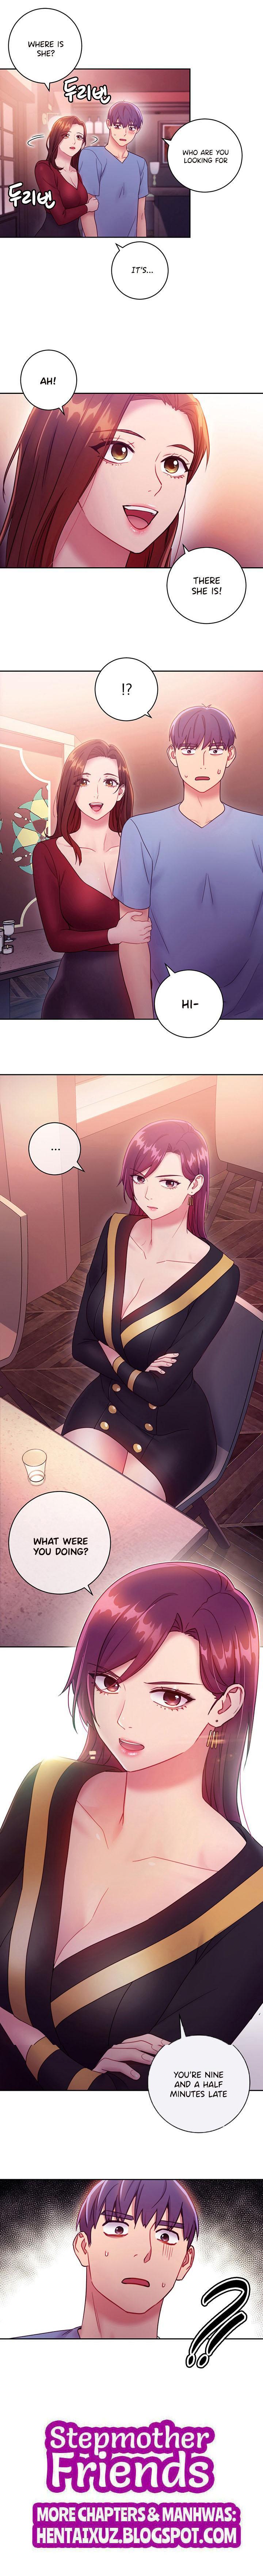 [Neck Pilllow] Stepmother Friends Ch.40/? [English] [Hentai Universe] NEW! 22/10/2020 326